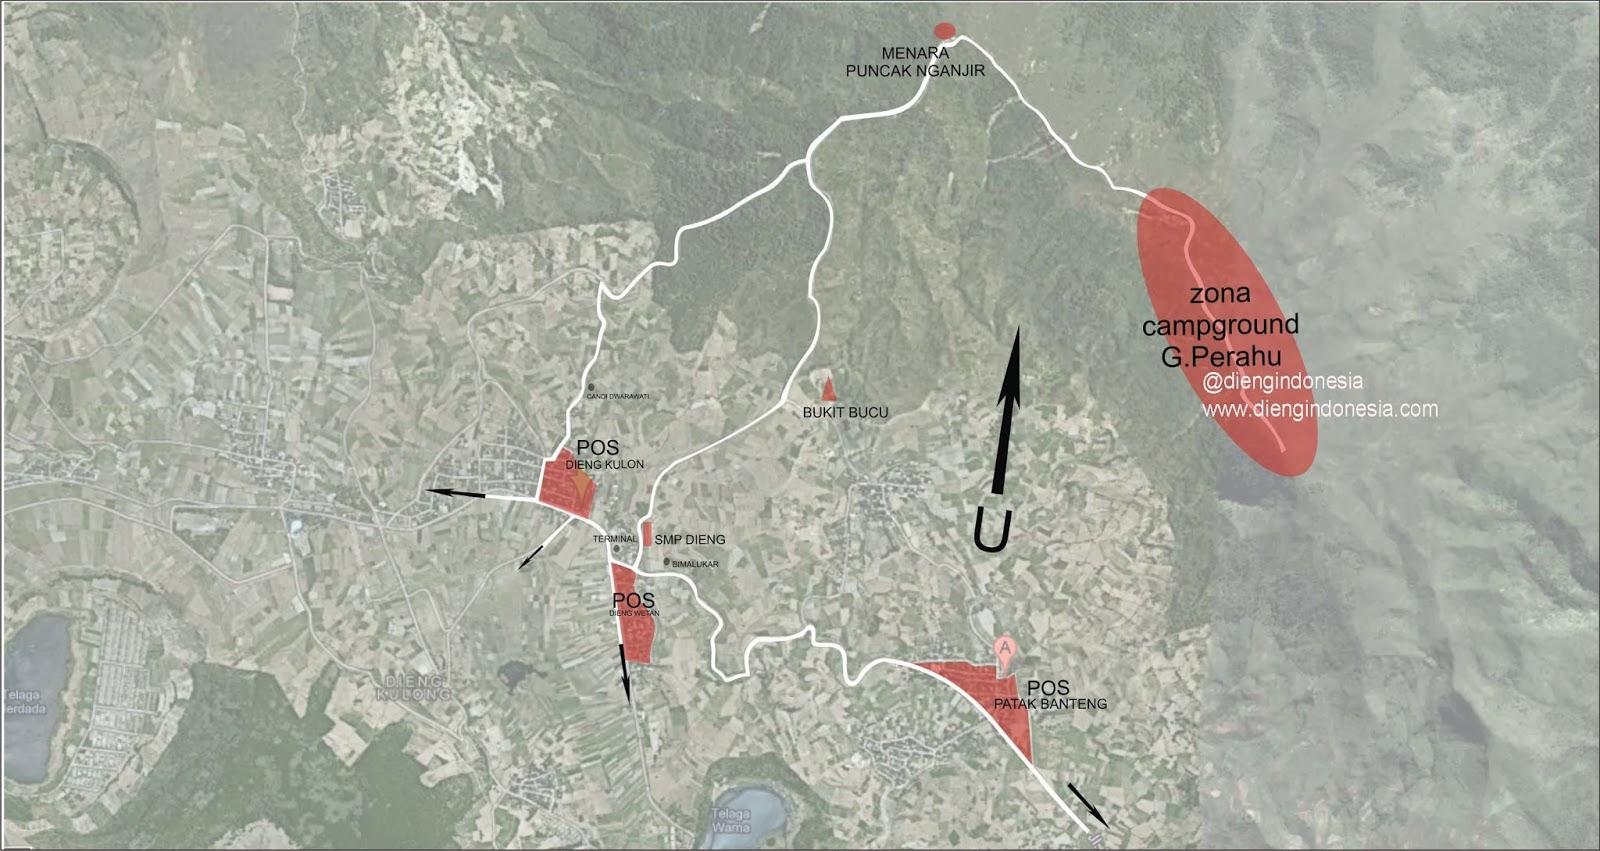 Peta Gunung Prau Dieng